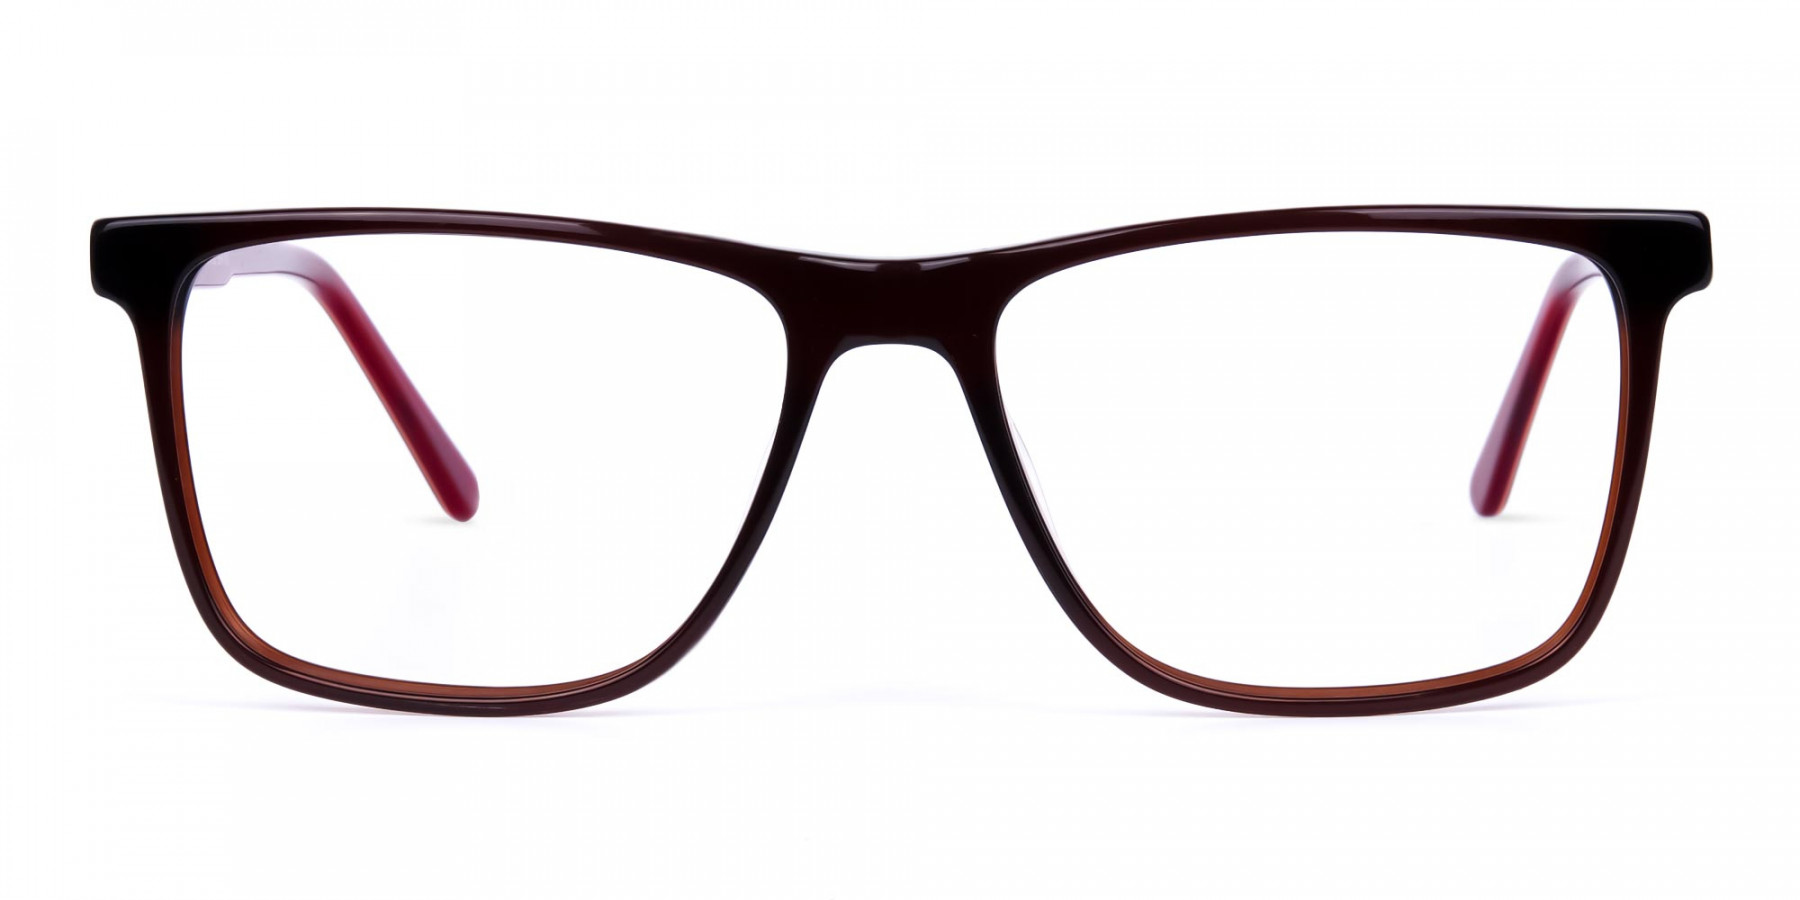 Stylish-Brown-Rectangular-Glasses-Frames-1